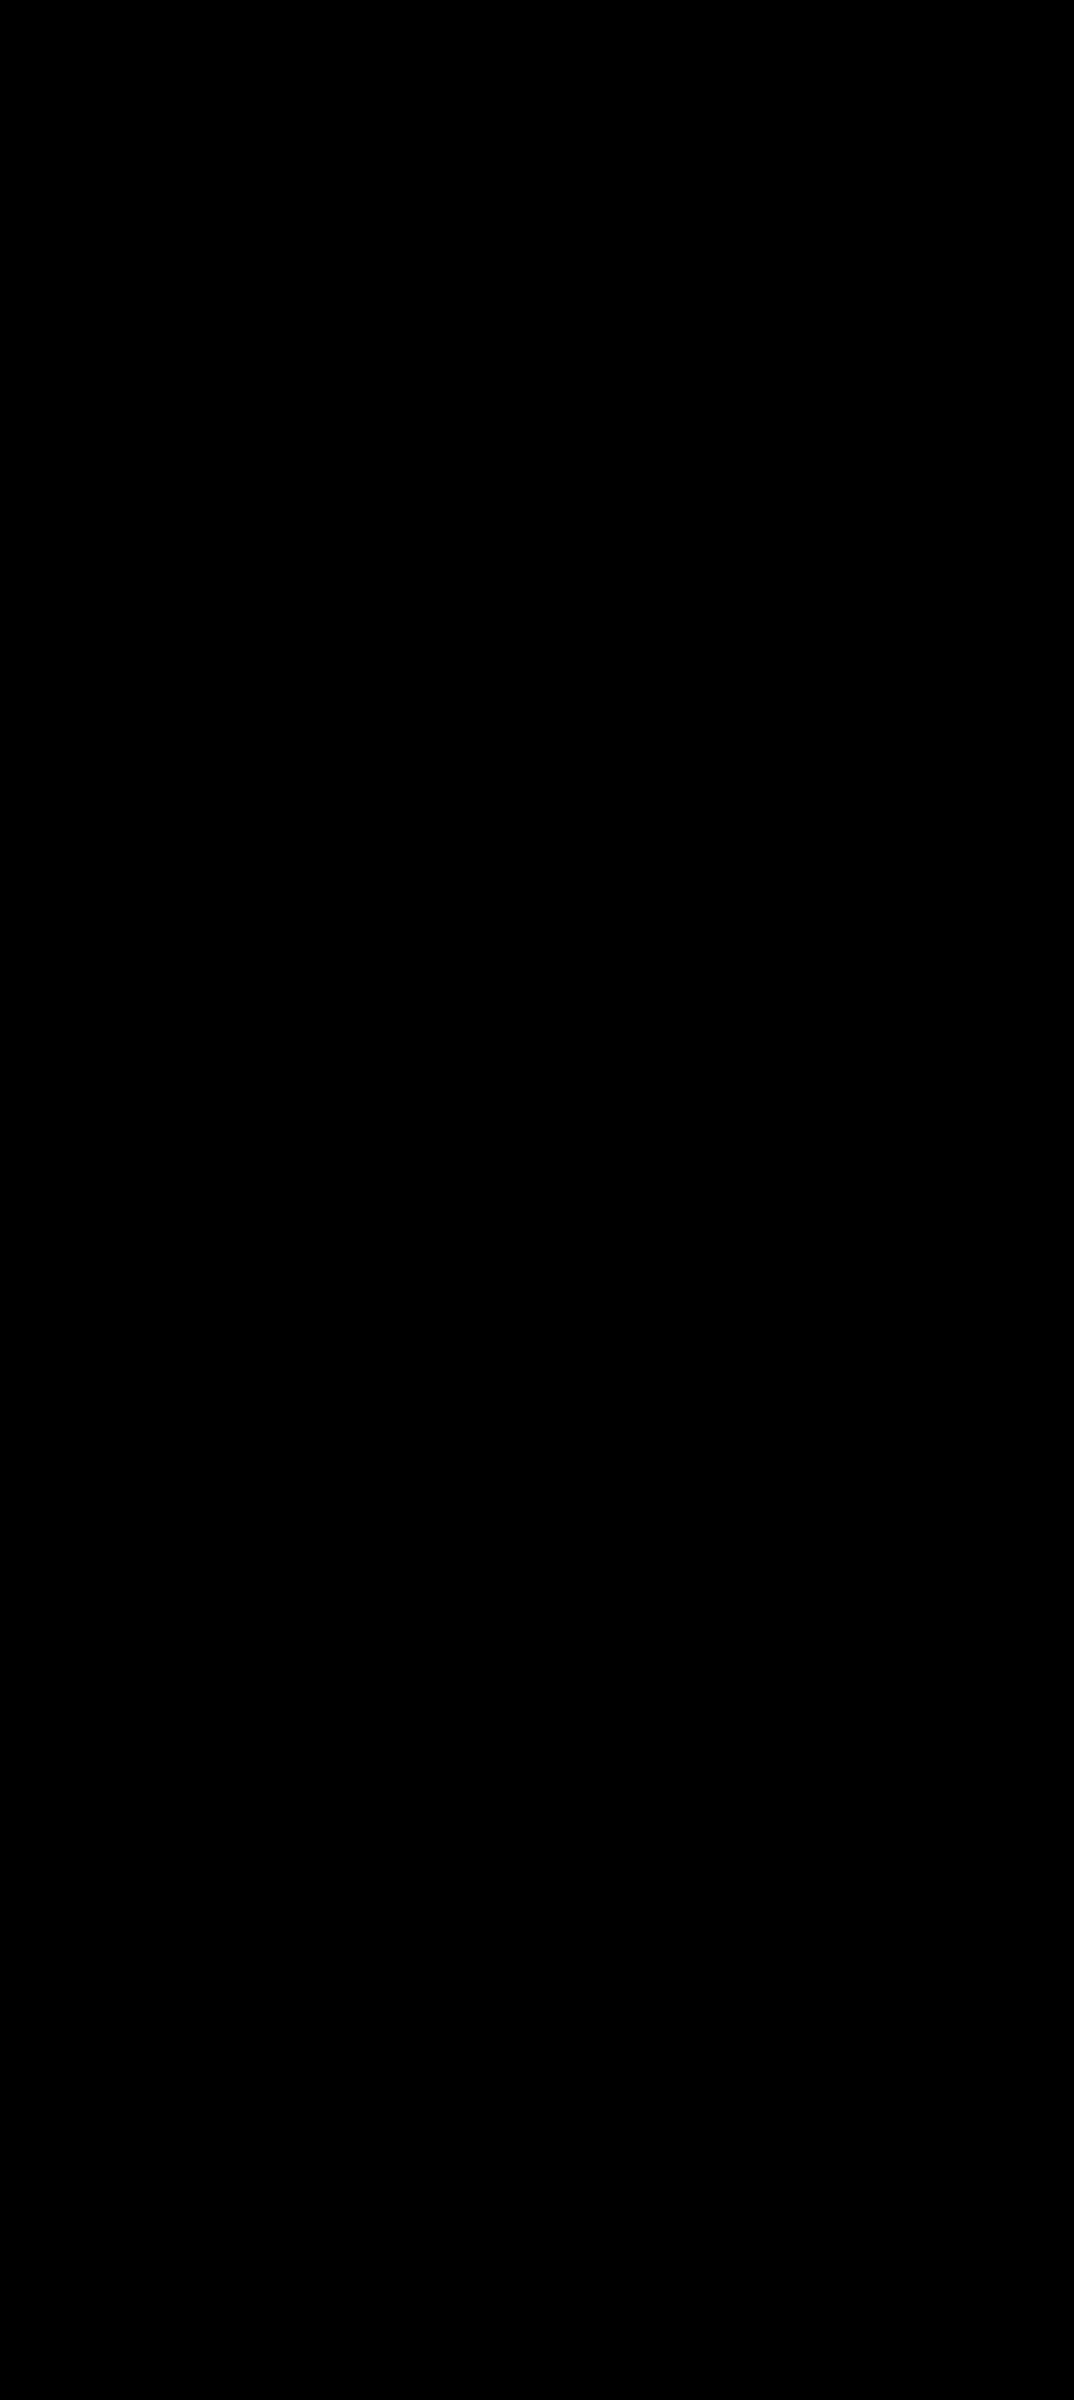 Stickman PNG HD Free - 123319